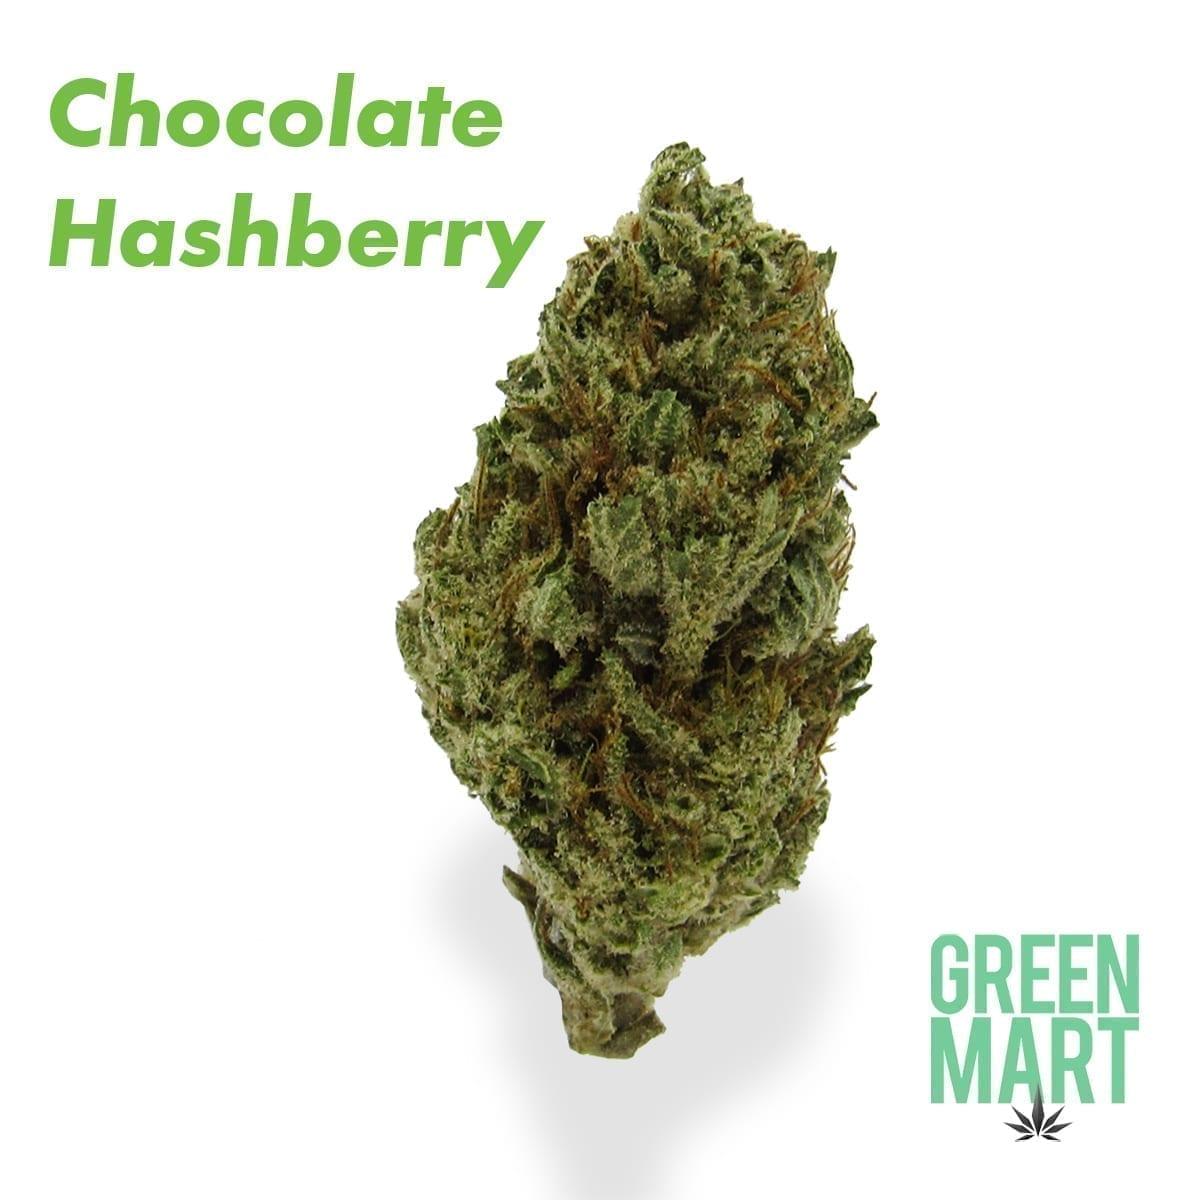 Chocolate Hashberry